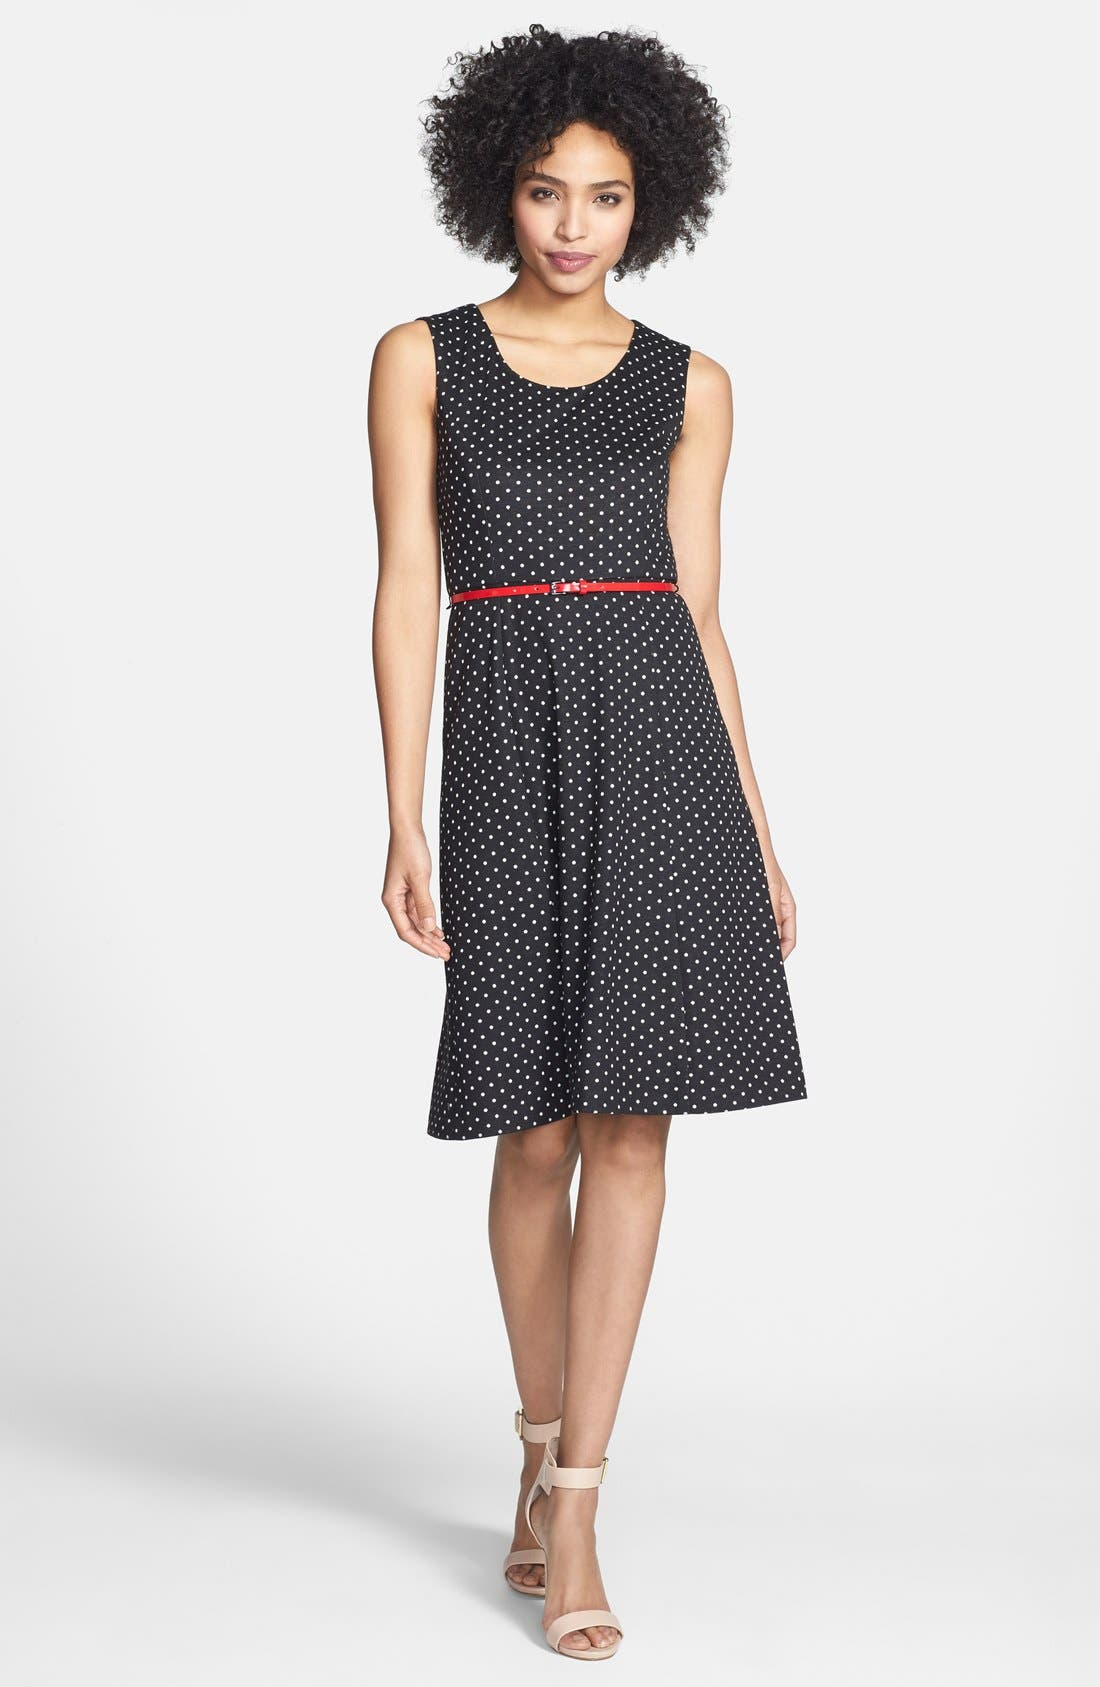 Alternate Image 1 Selected - Anne Klein Belted Polka Dot Ponte Dress (Regular & Petite)